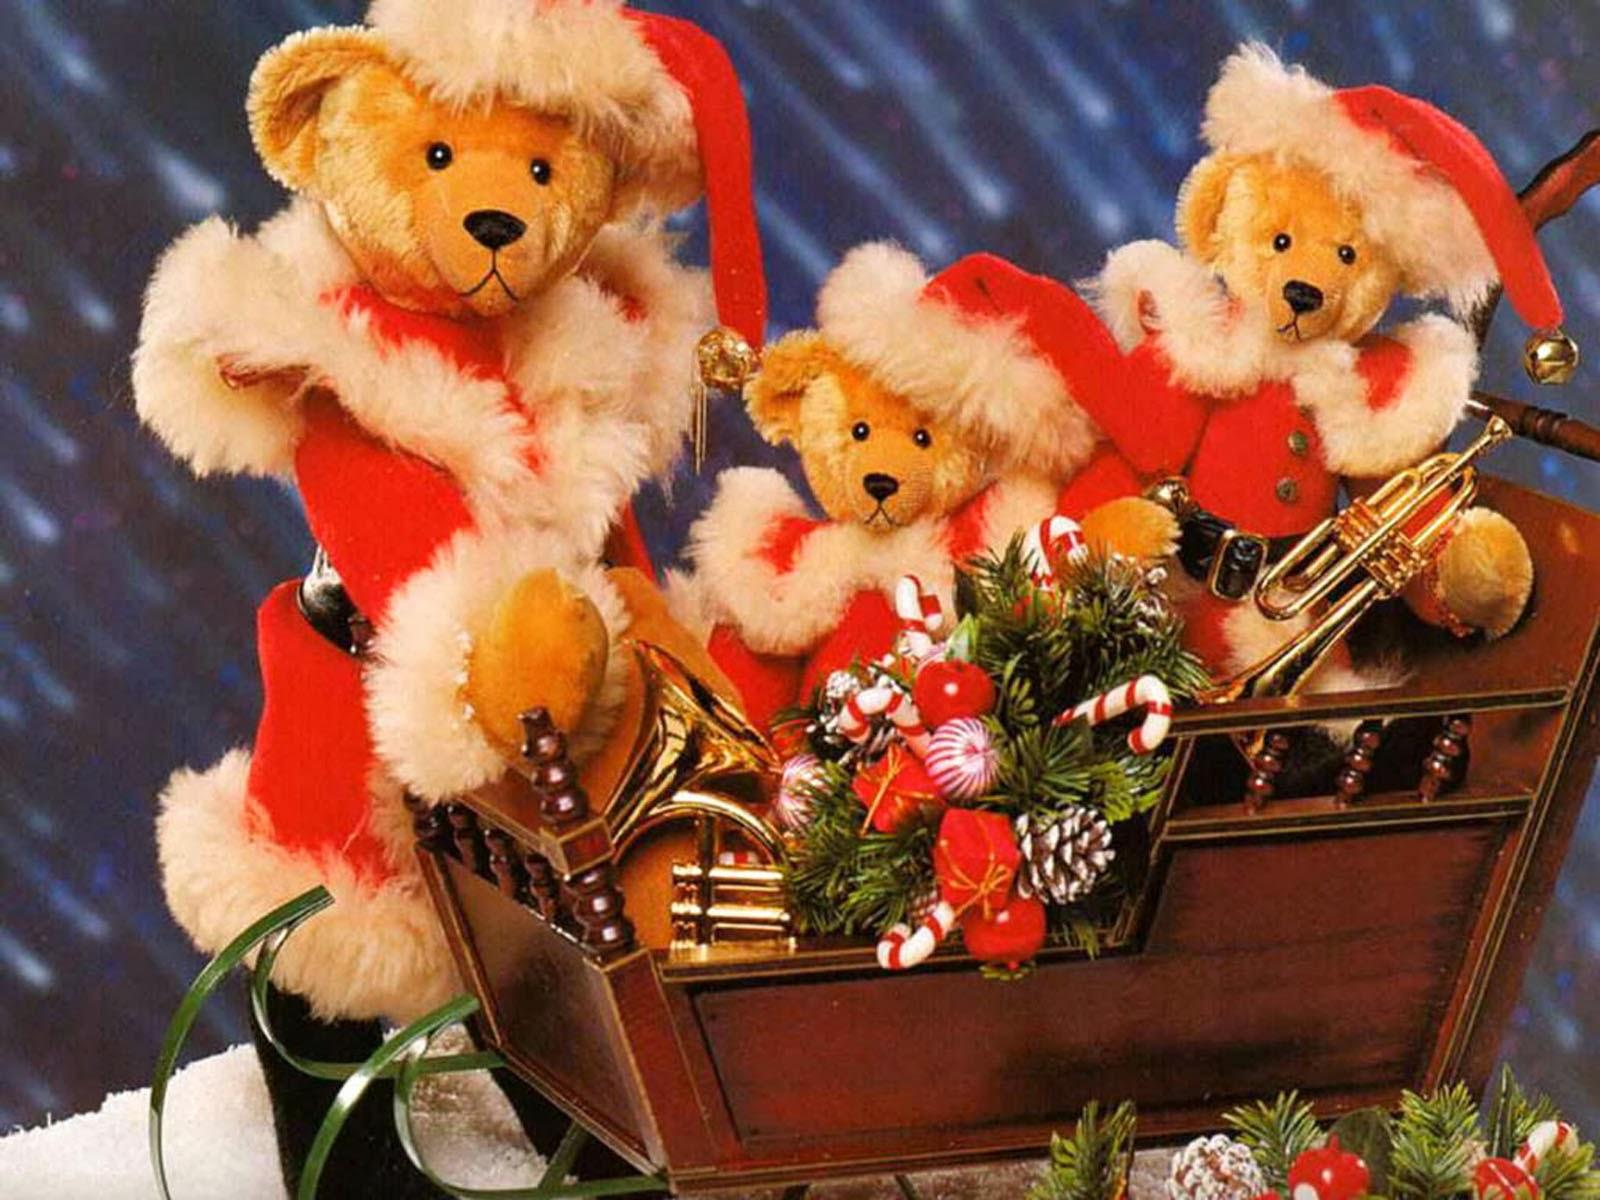 Wallpaper download karna hai - Teddy Bear Christmas Wallpaper